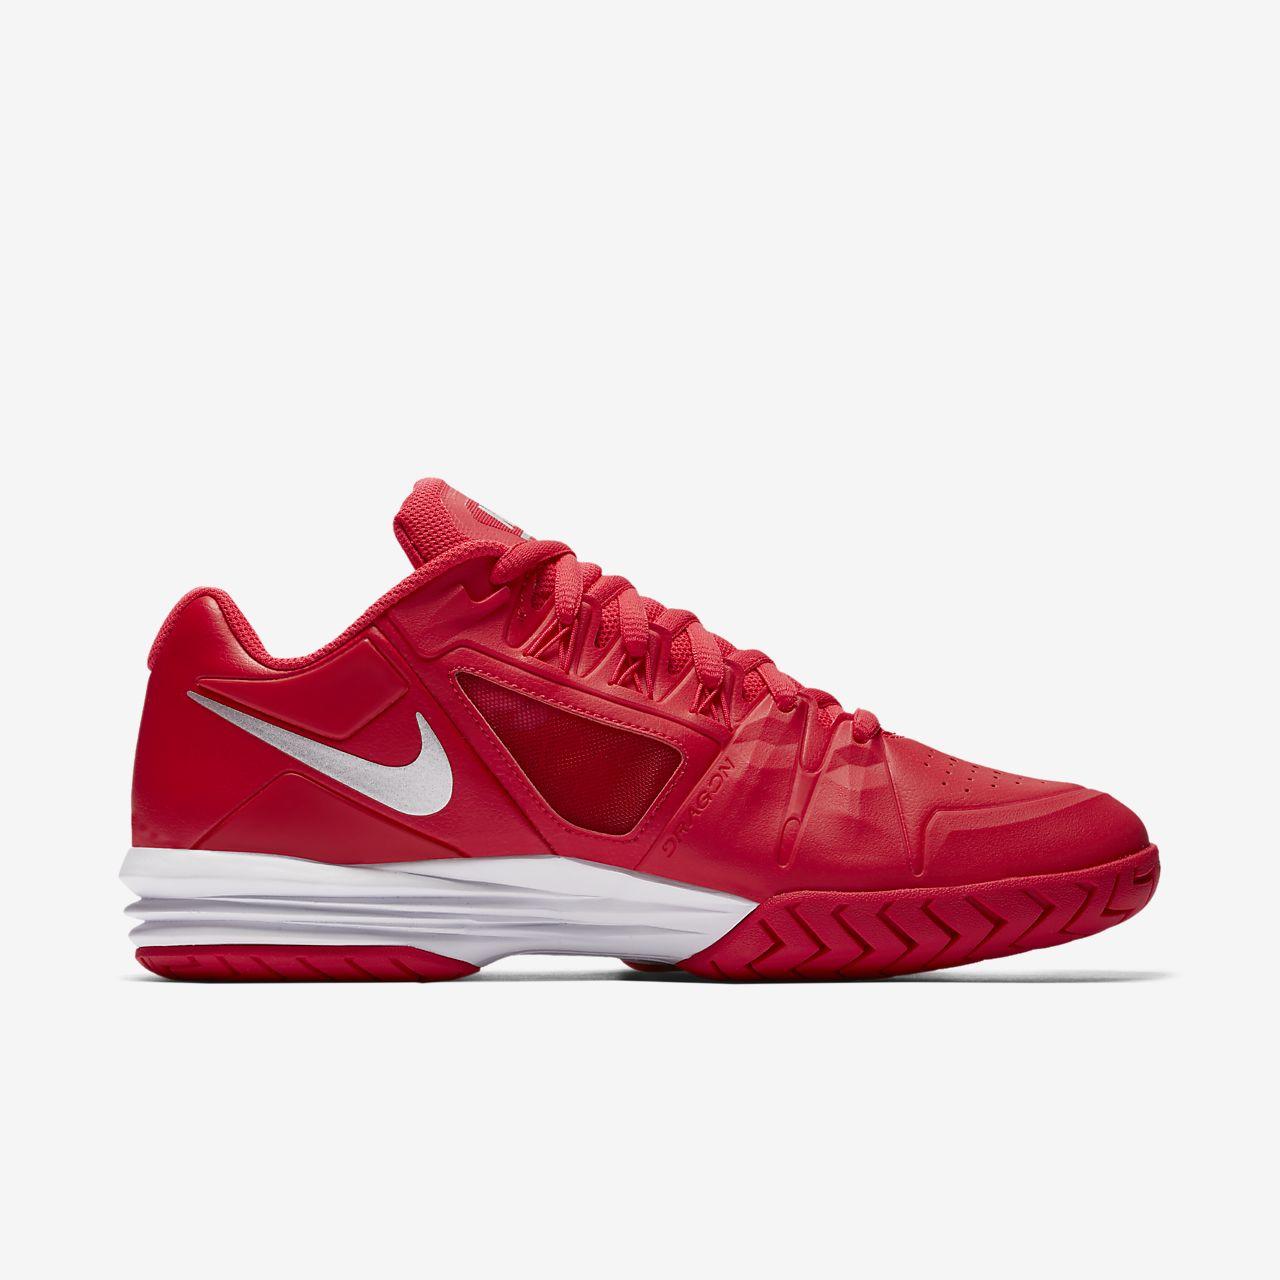 ef2c91bff9aeb NikeCourt Lunar Ballistec 1.5 Mens Tennis Shoe .